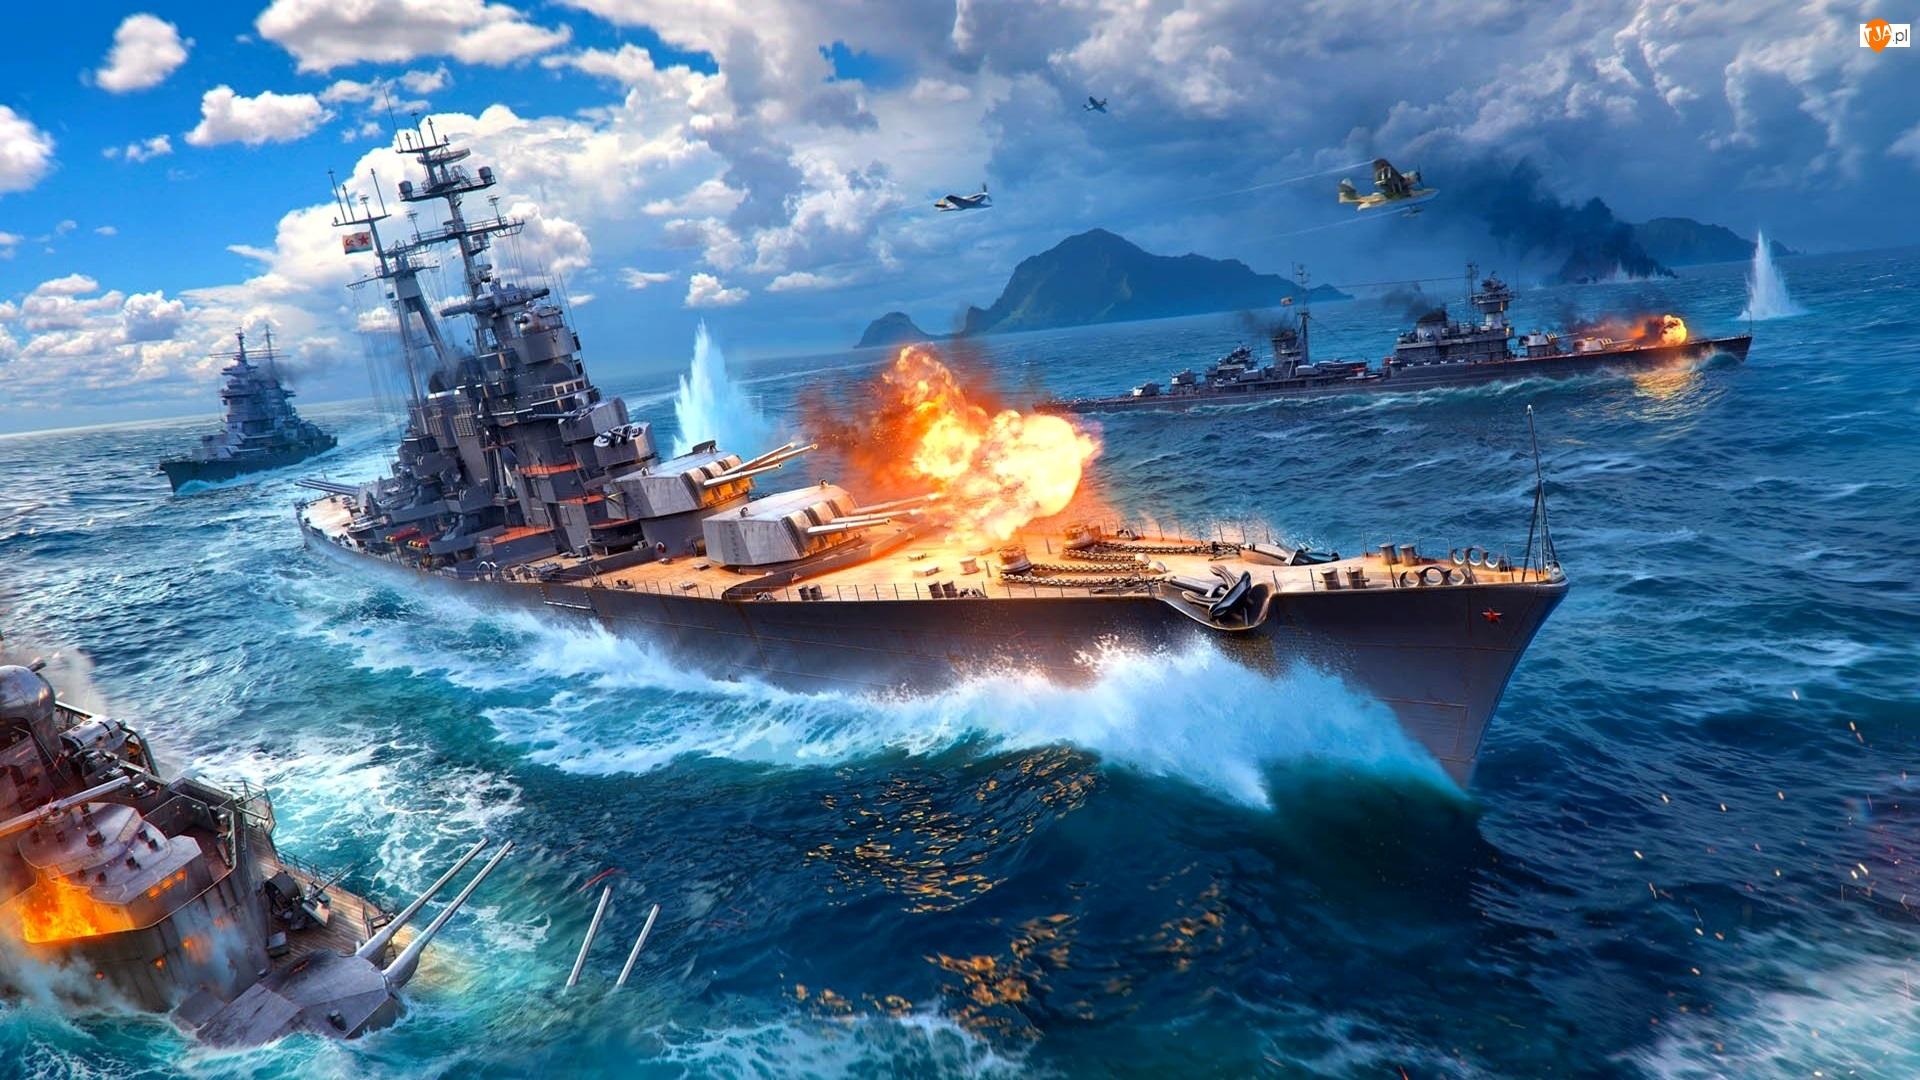 Ogień, World of Warships, Okręty, Morze, Wojenne